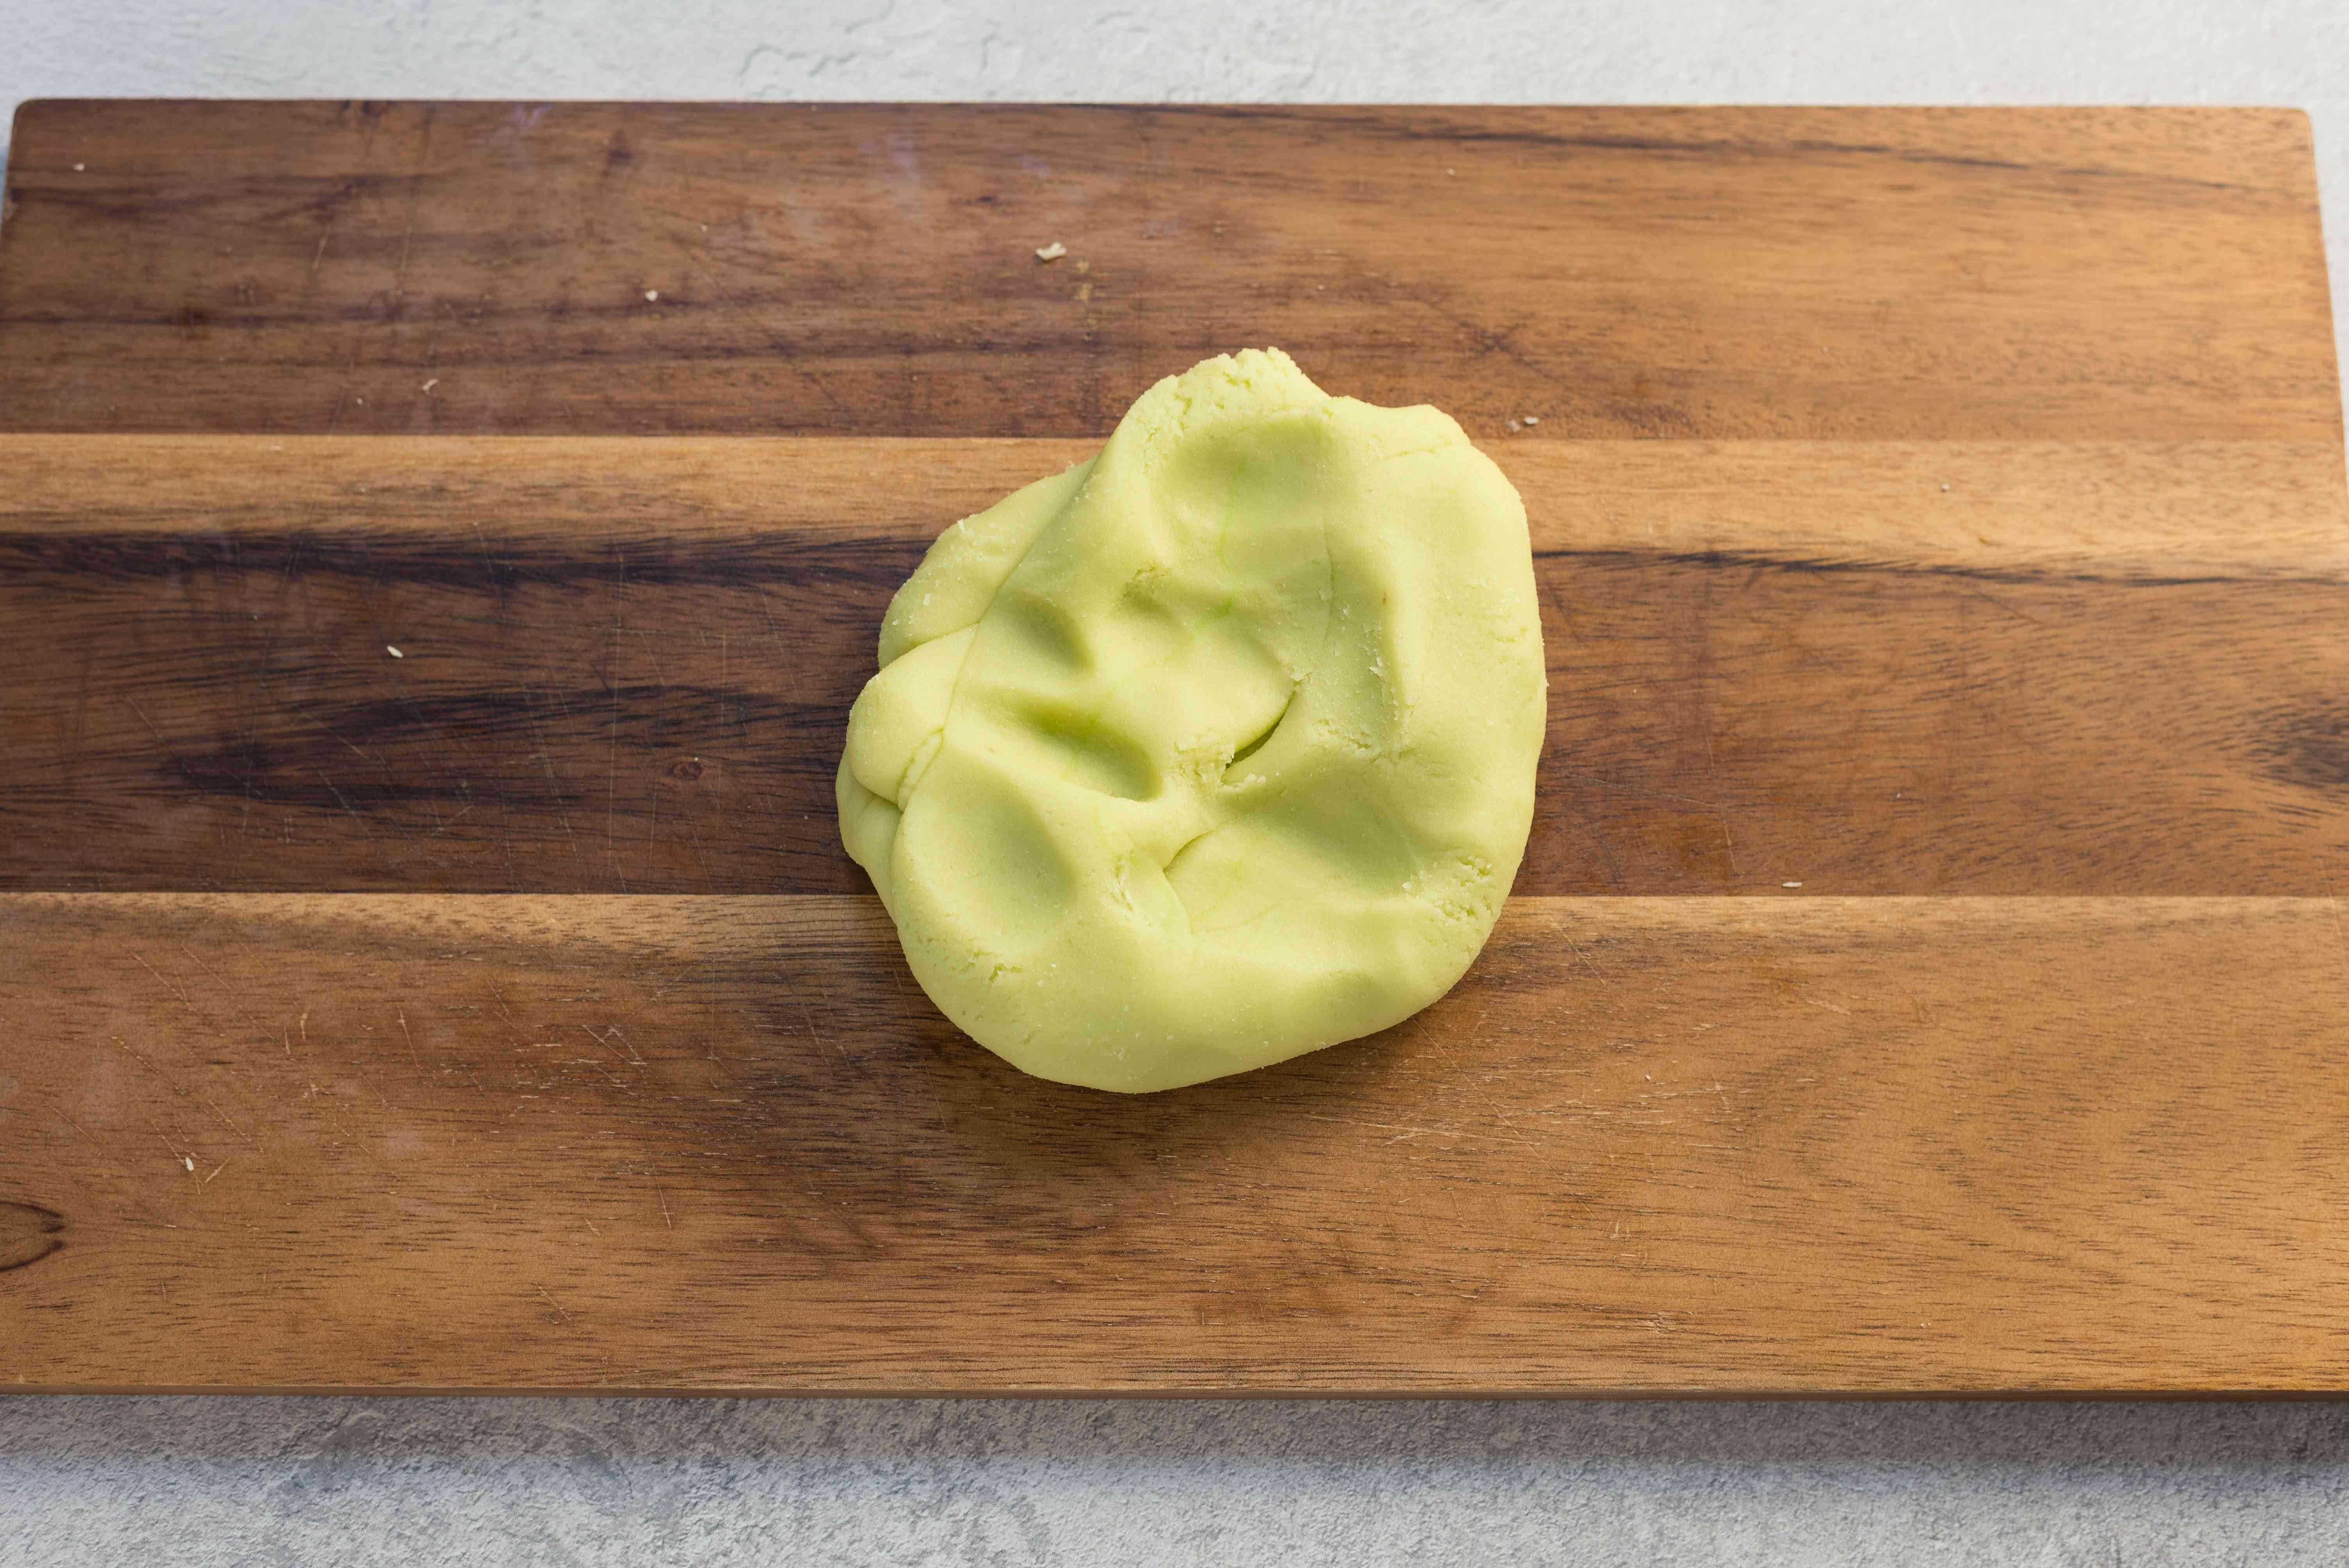 Knead green coloring into marzipan